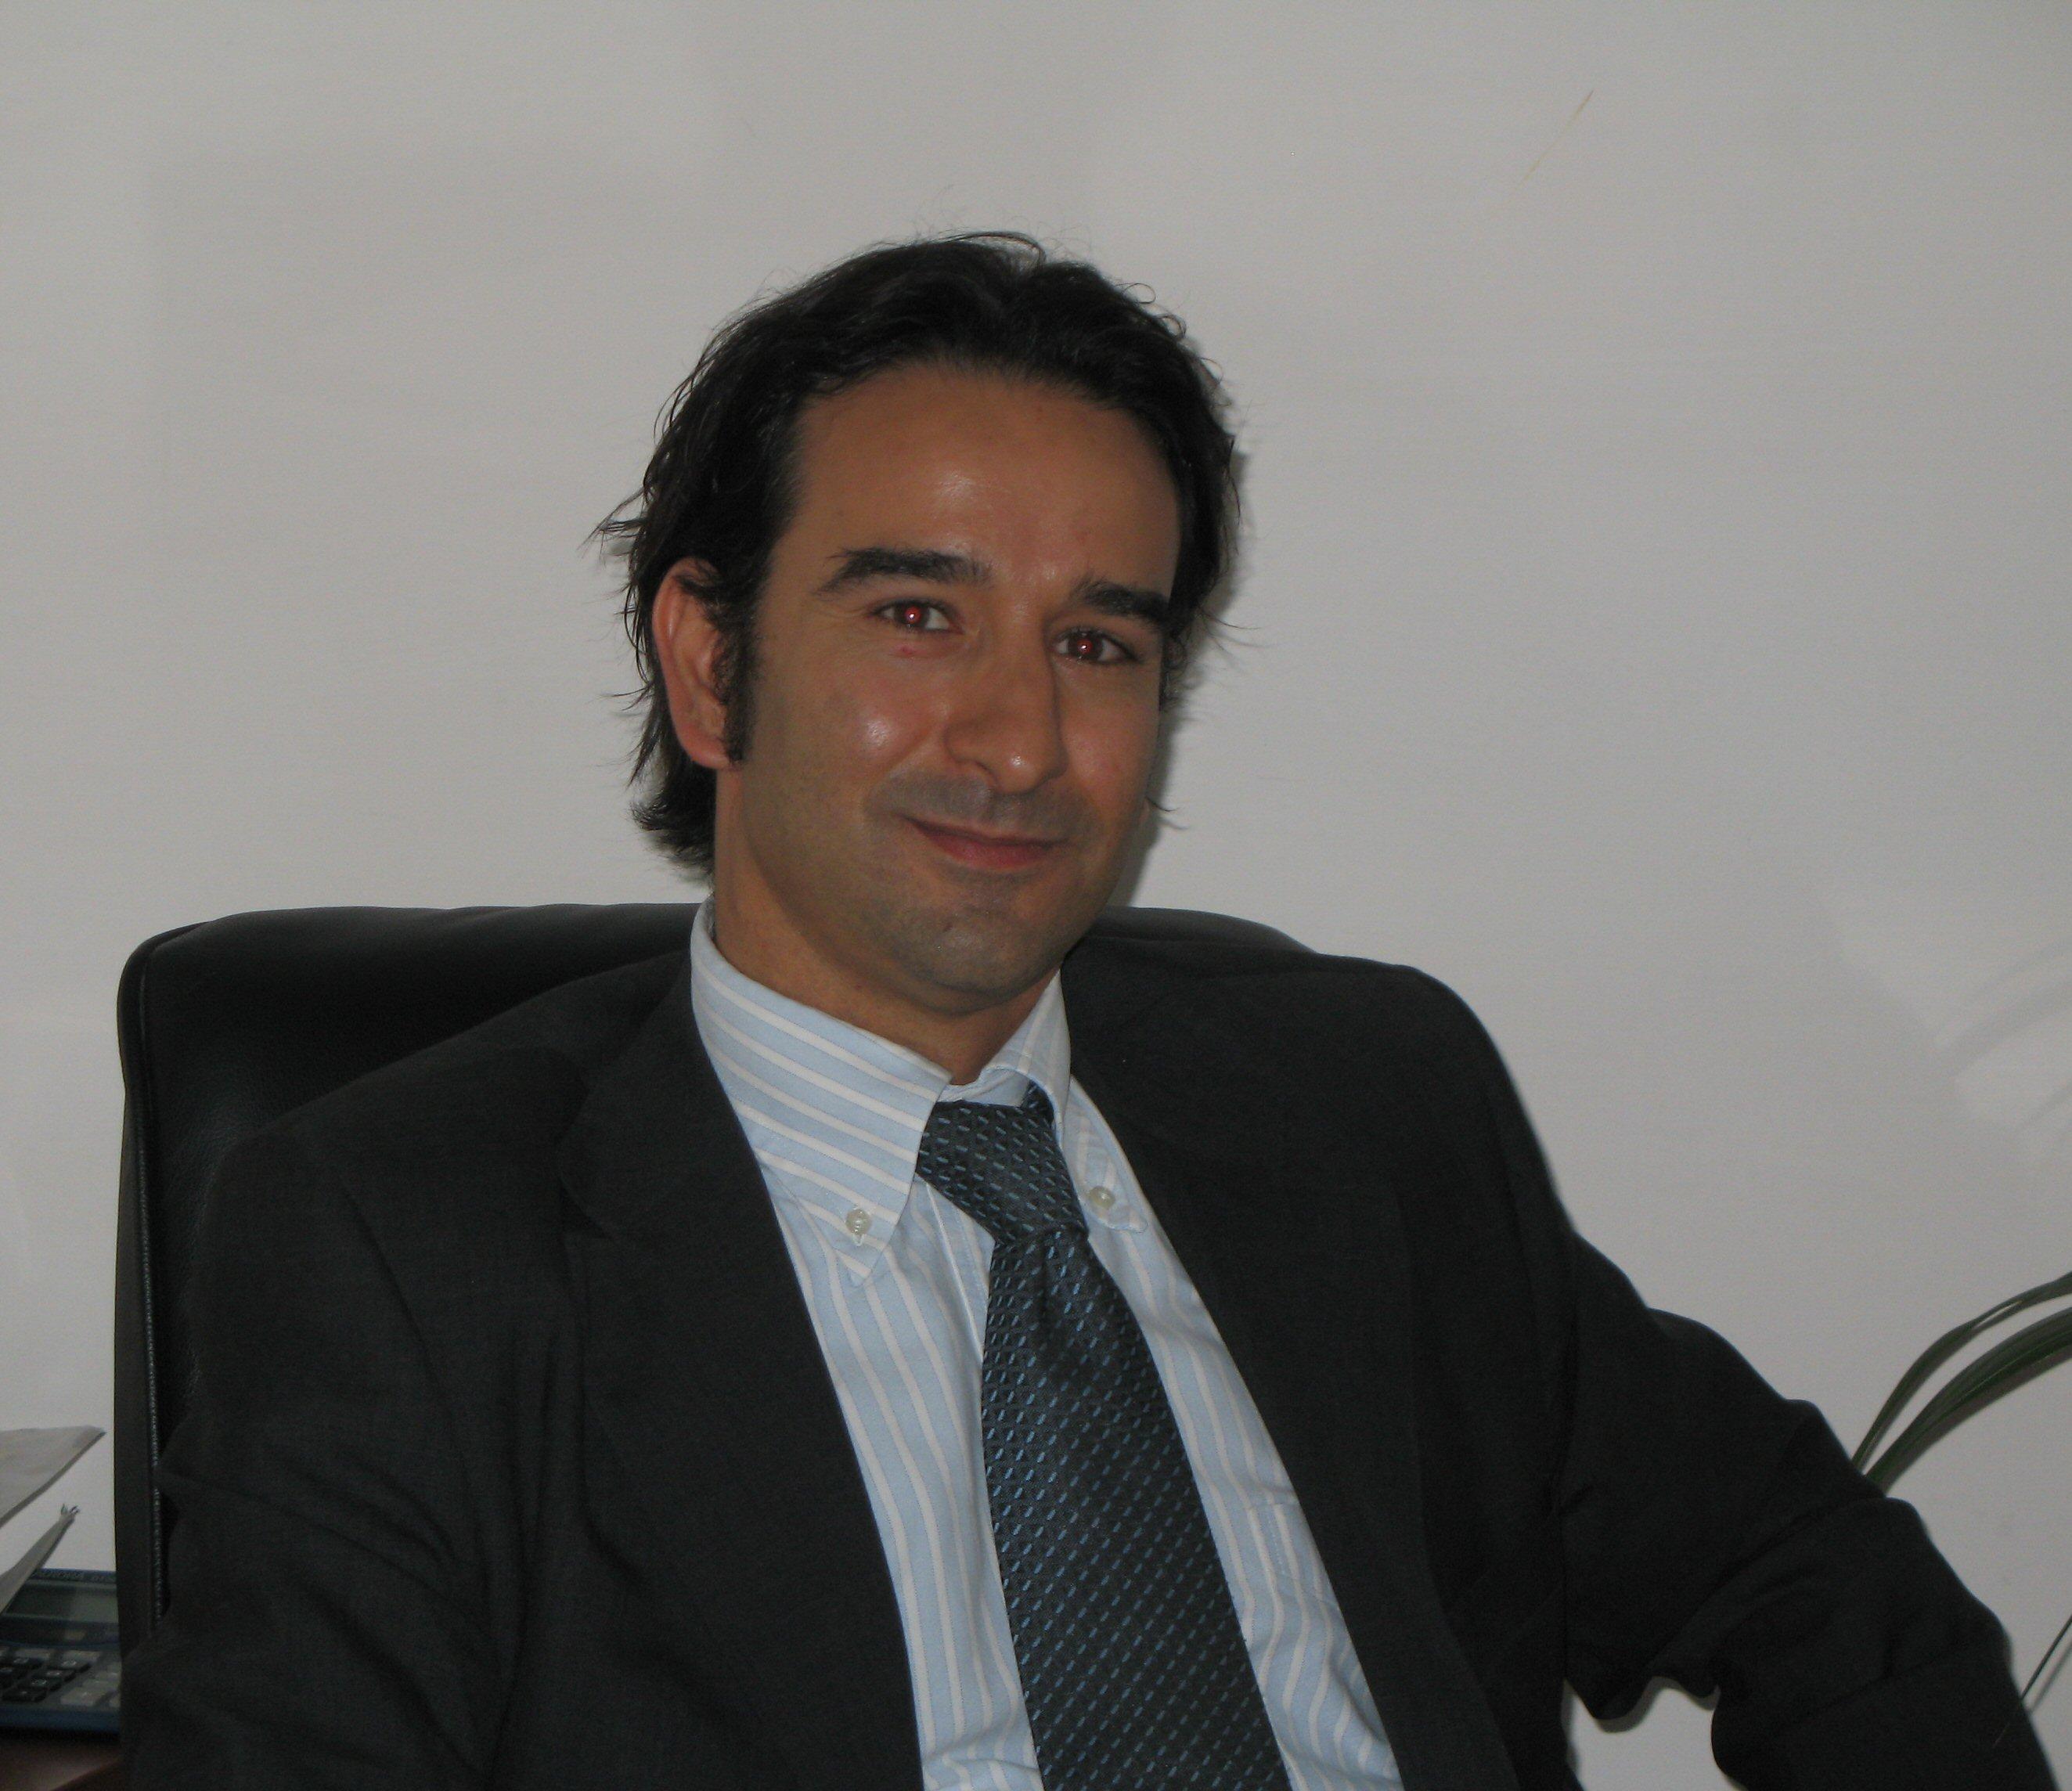 Ottavio Masini